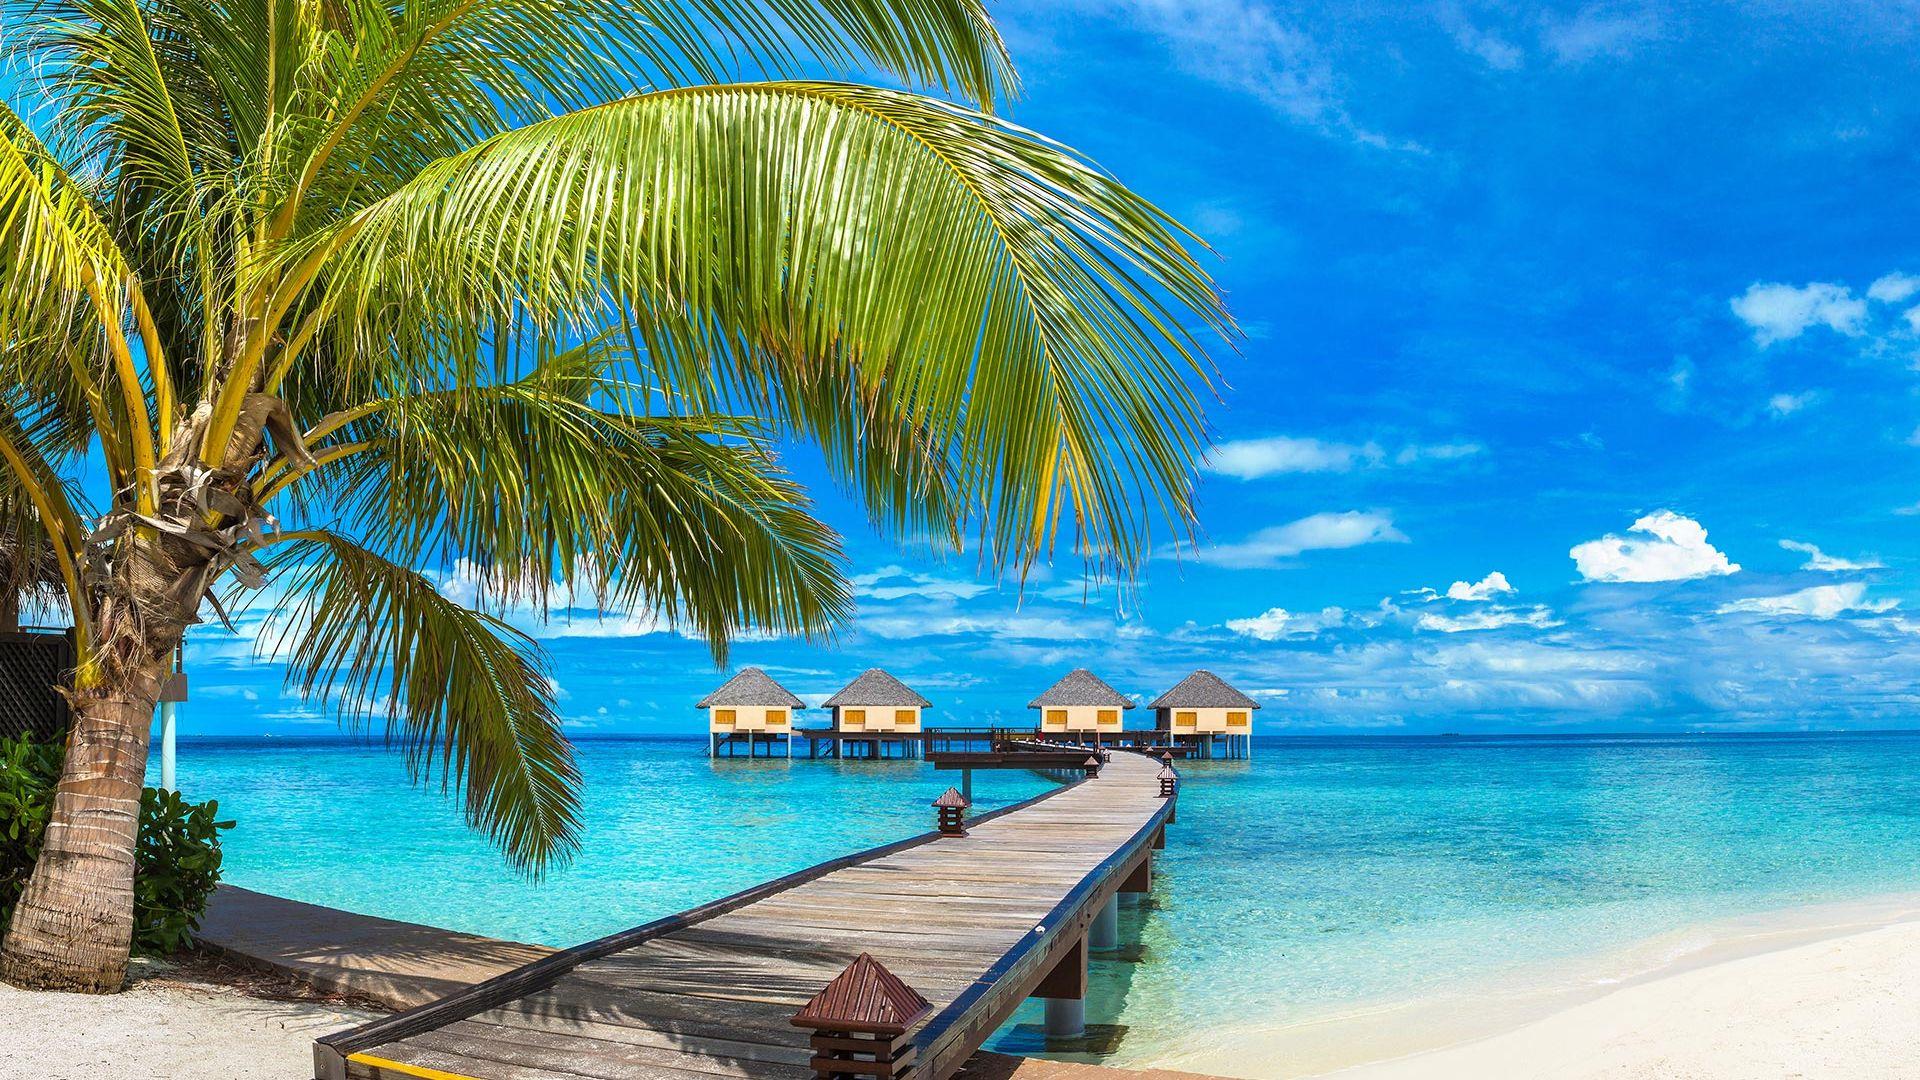 Sejur plaja Maldive, 12 zile